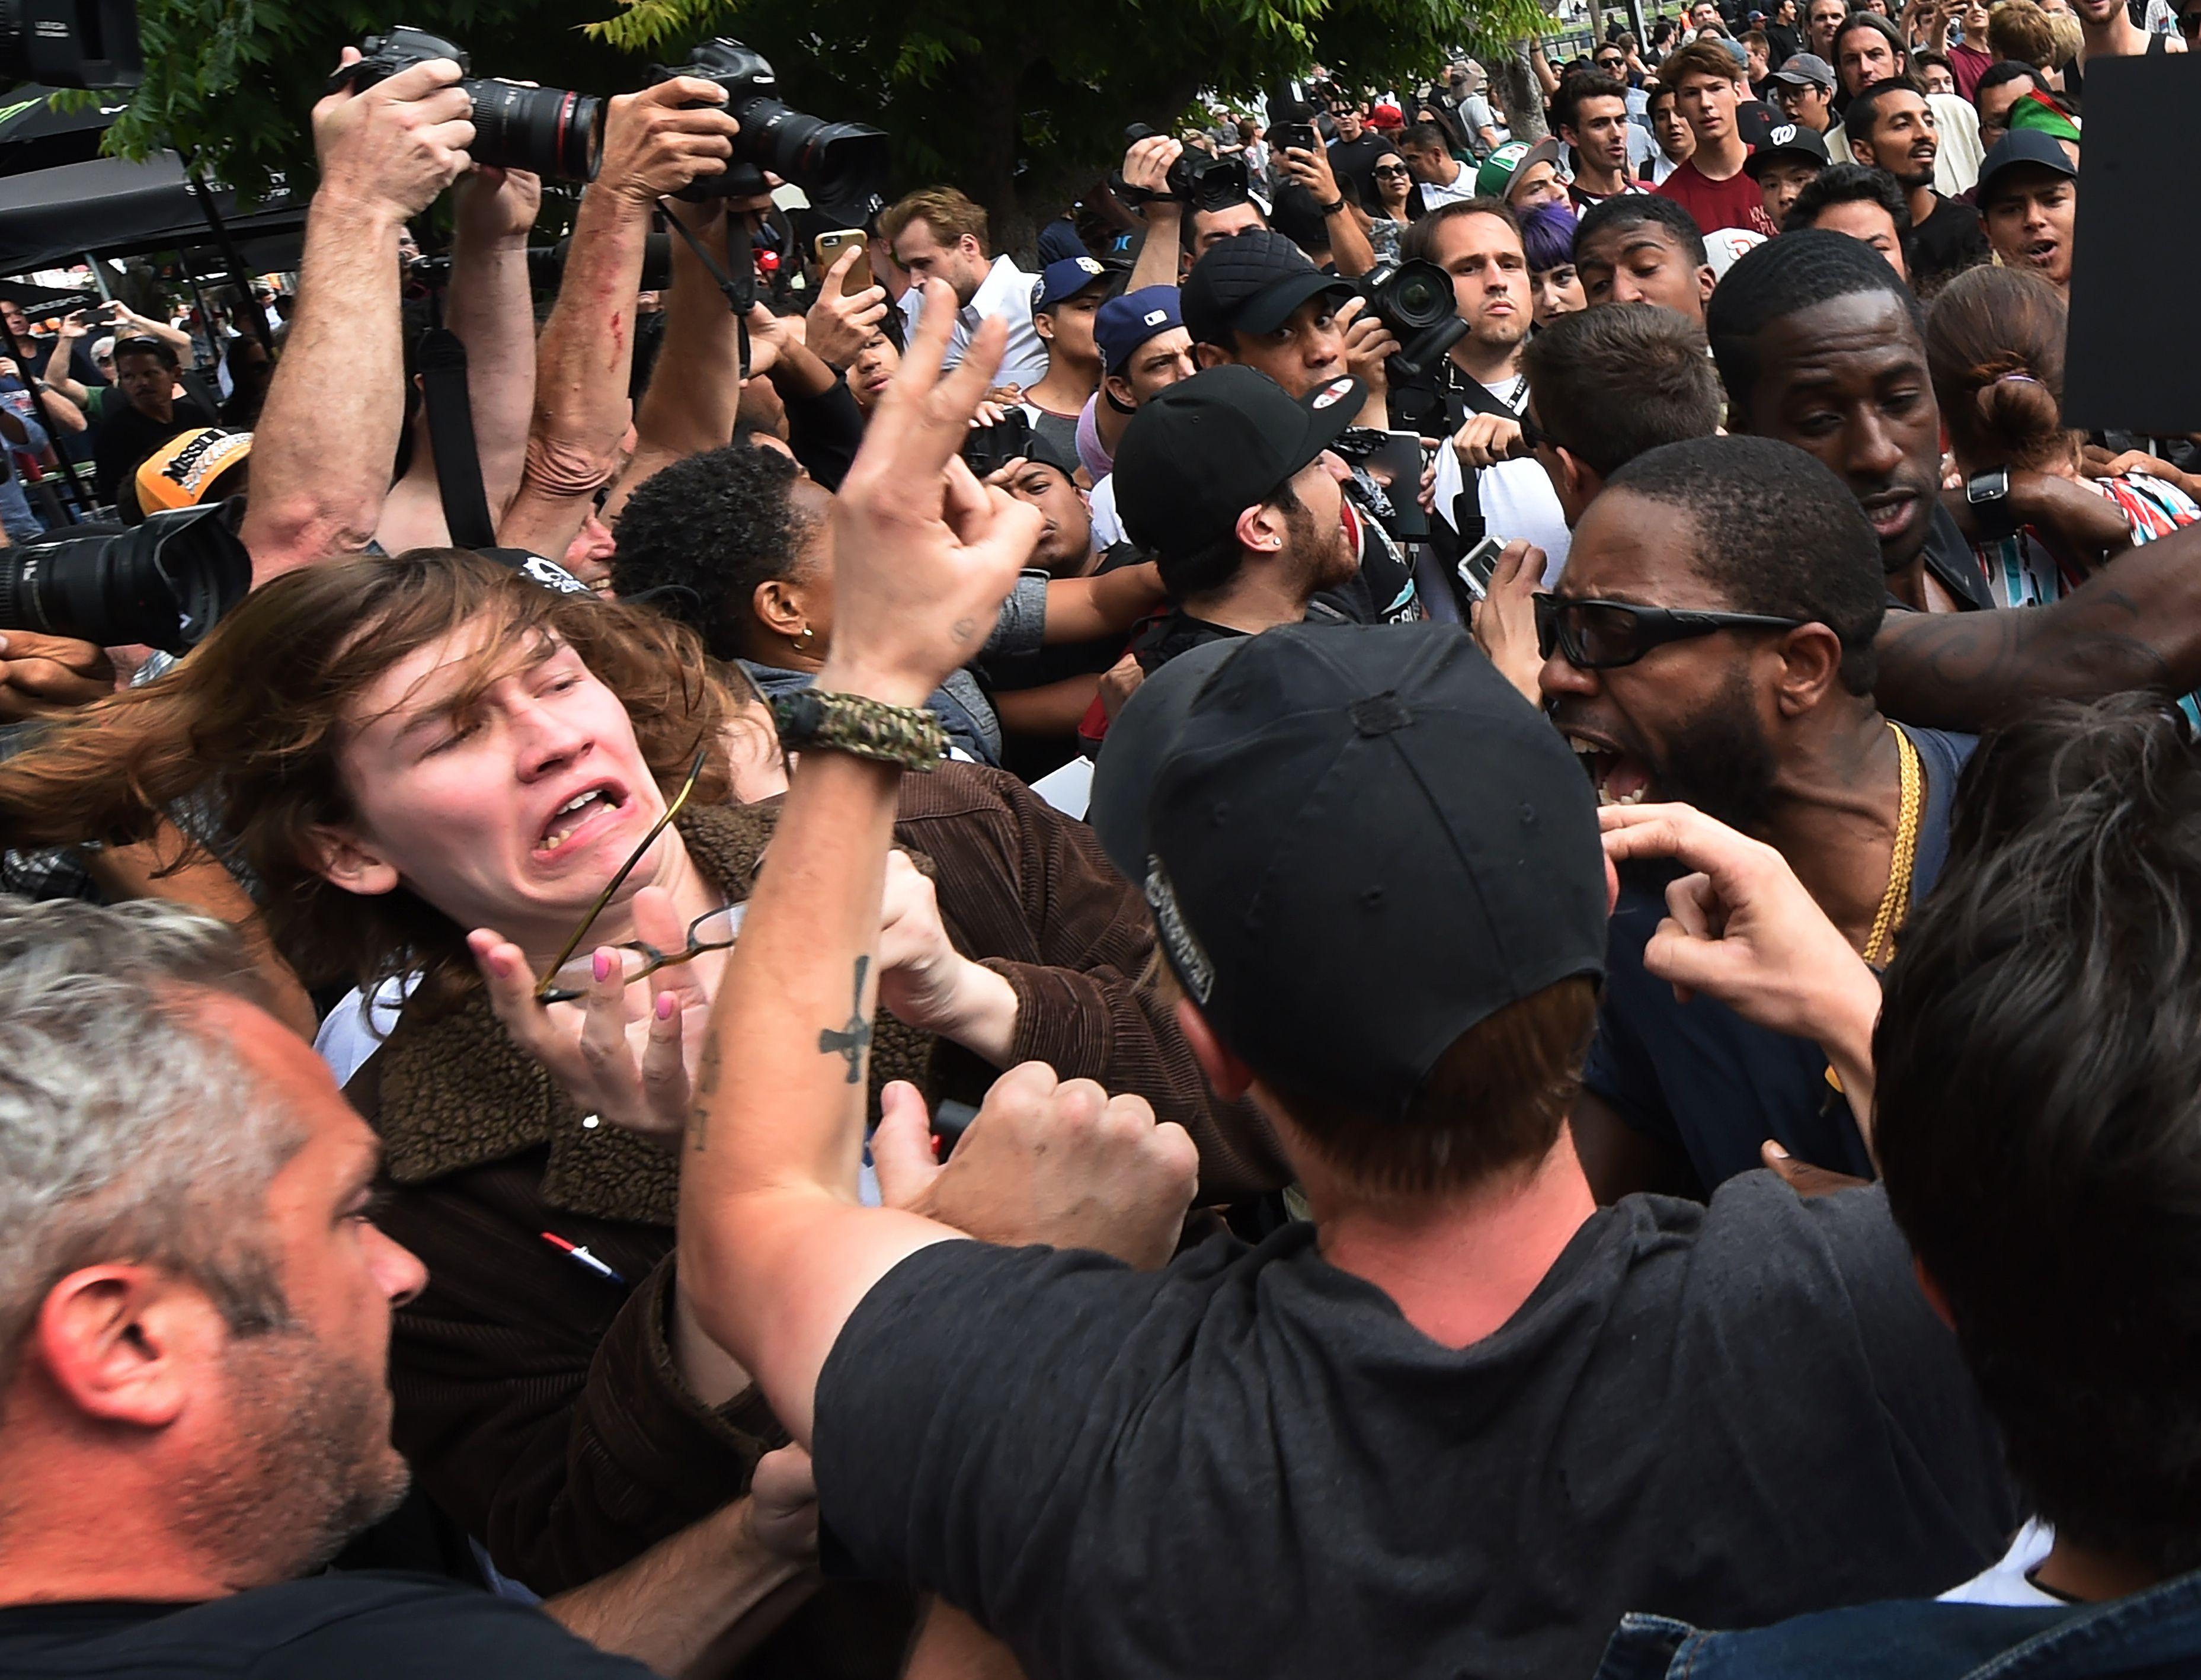 Trump supporters, protestors clash in San Diego, 35 arrested